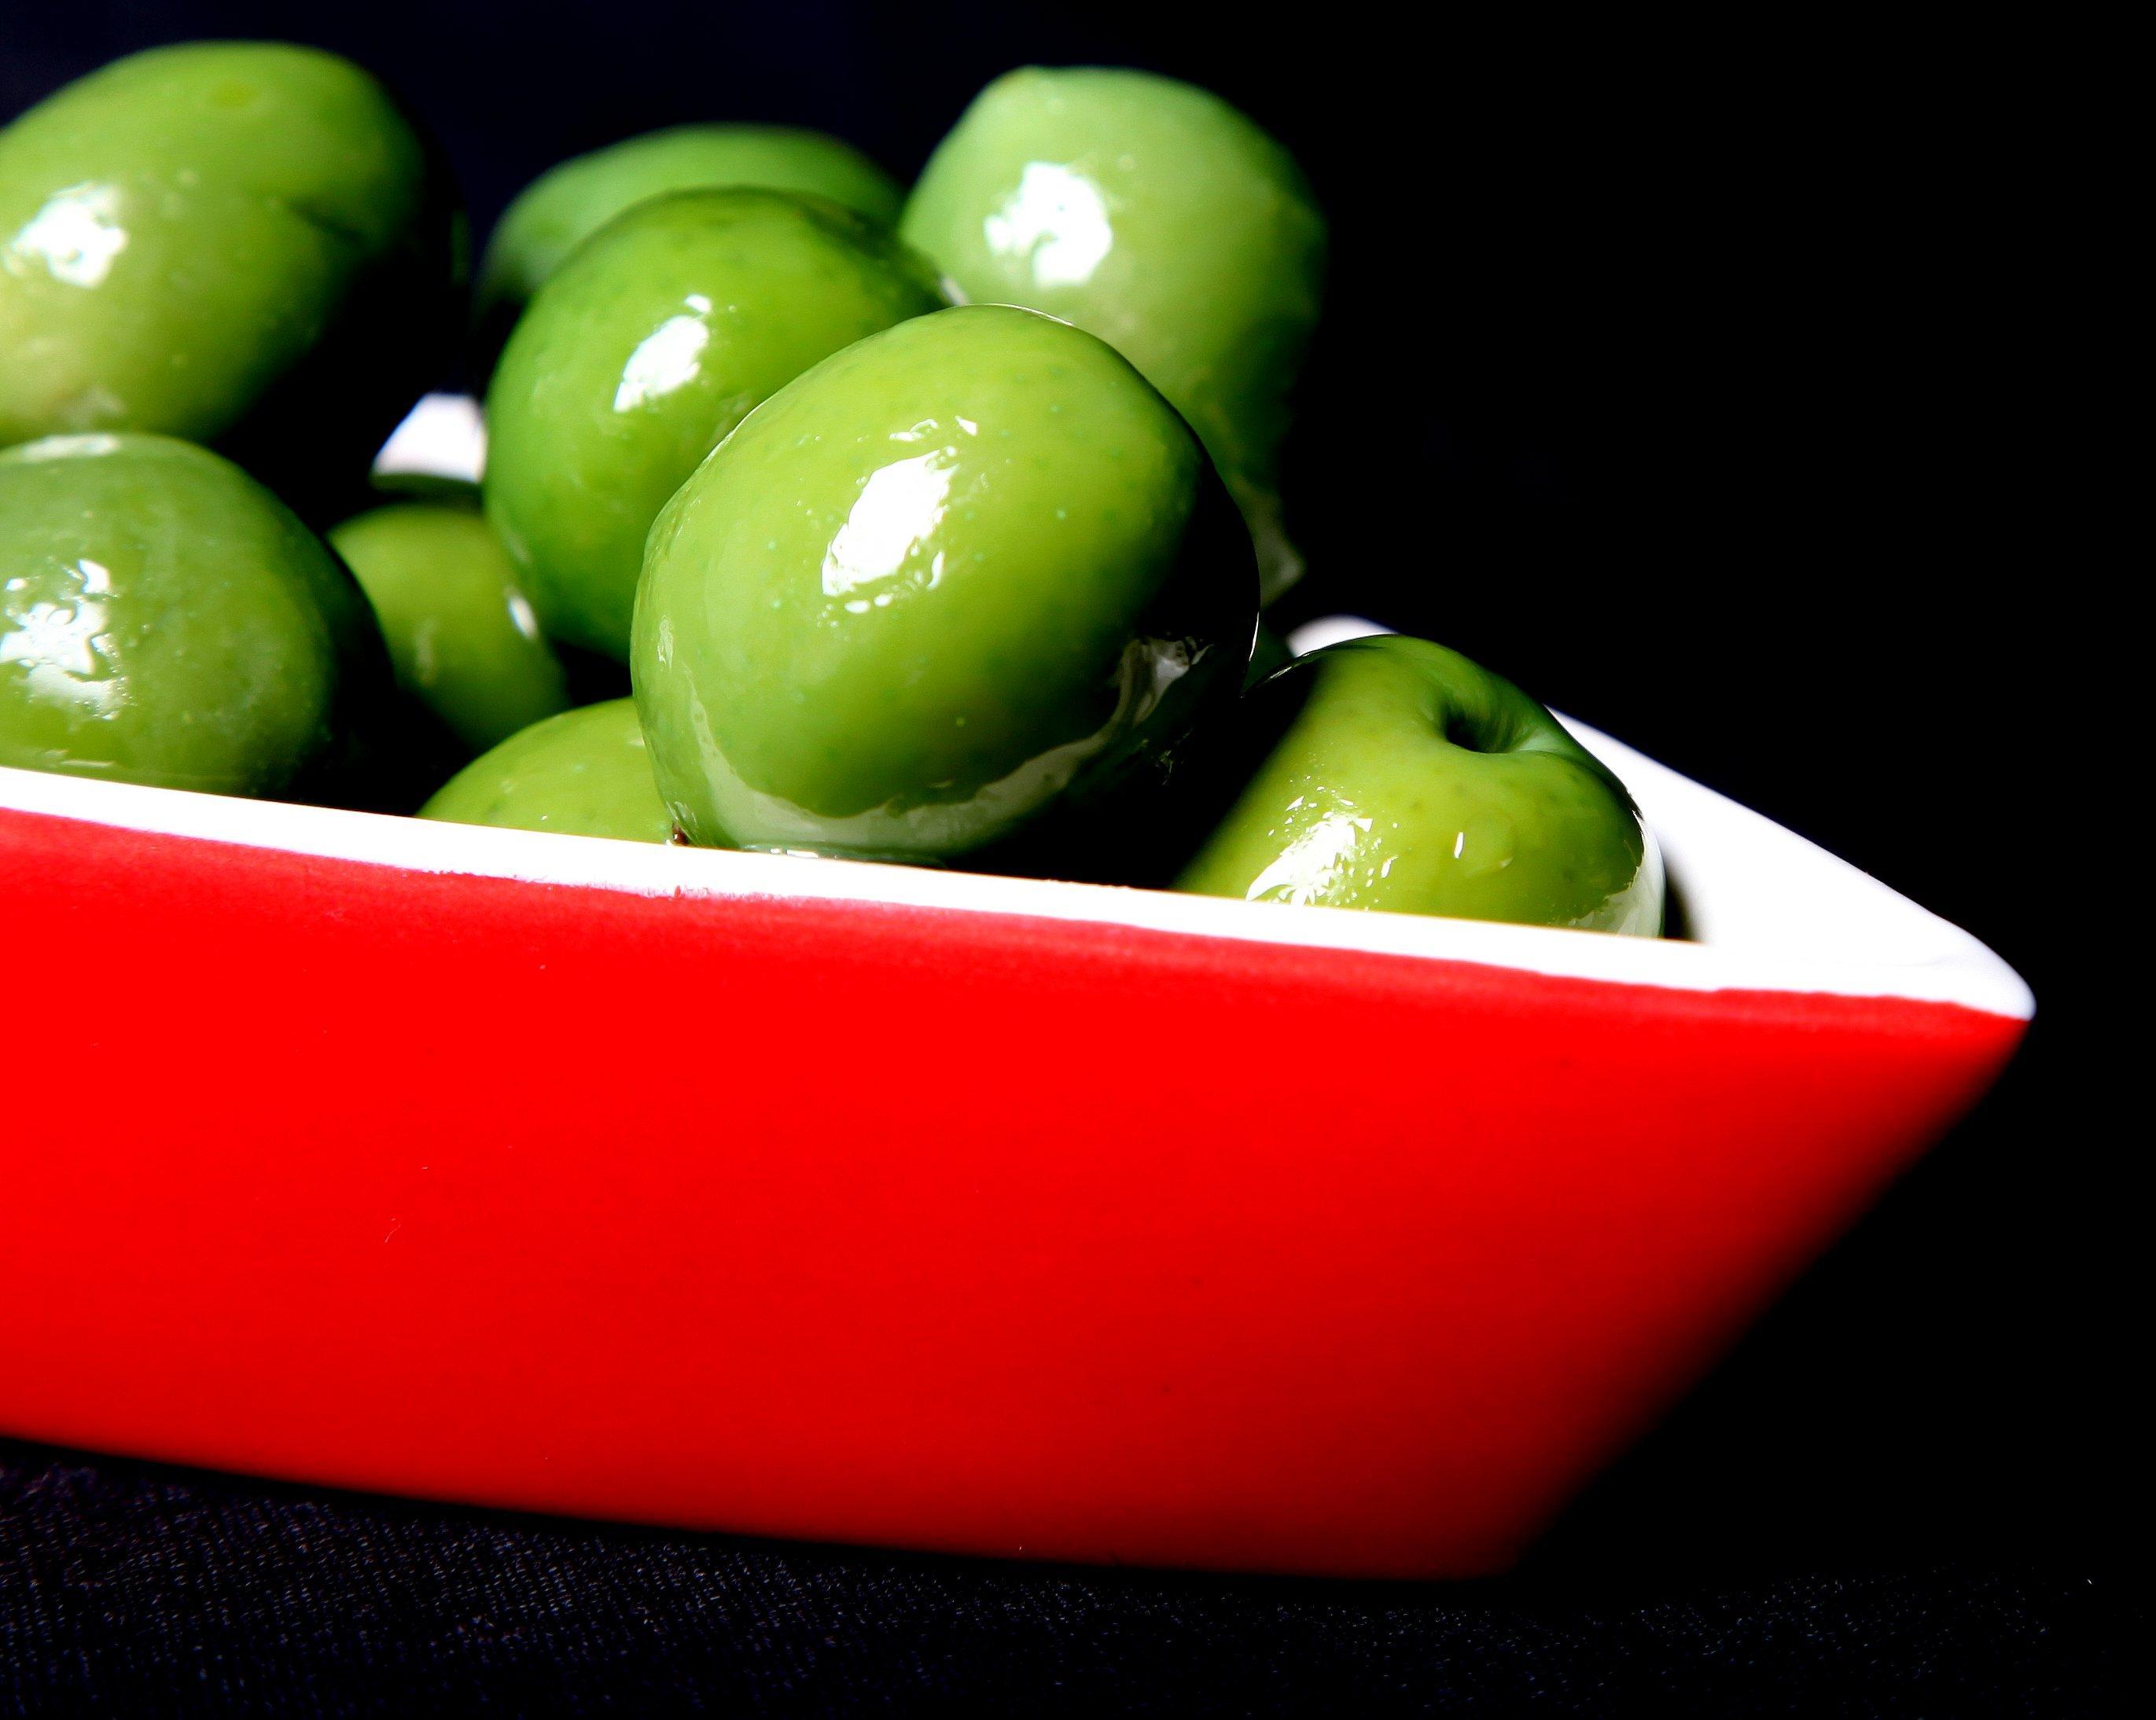 recette de tapenade aux olives vertes de ma grand m re verduras hortalizas y ensaladas blog. Black Bedroom Furniture Sets. Home Design Ideas